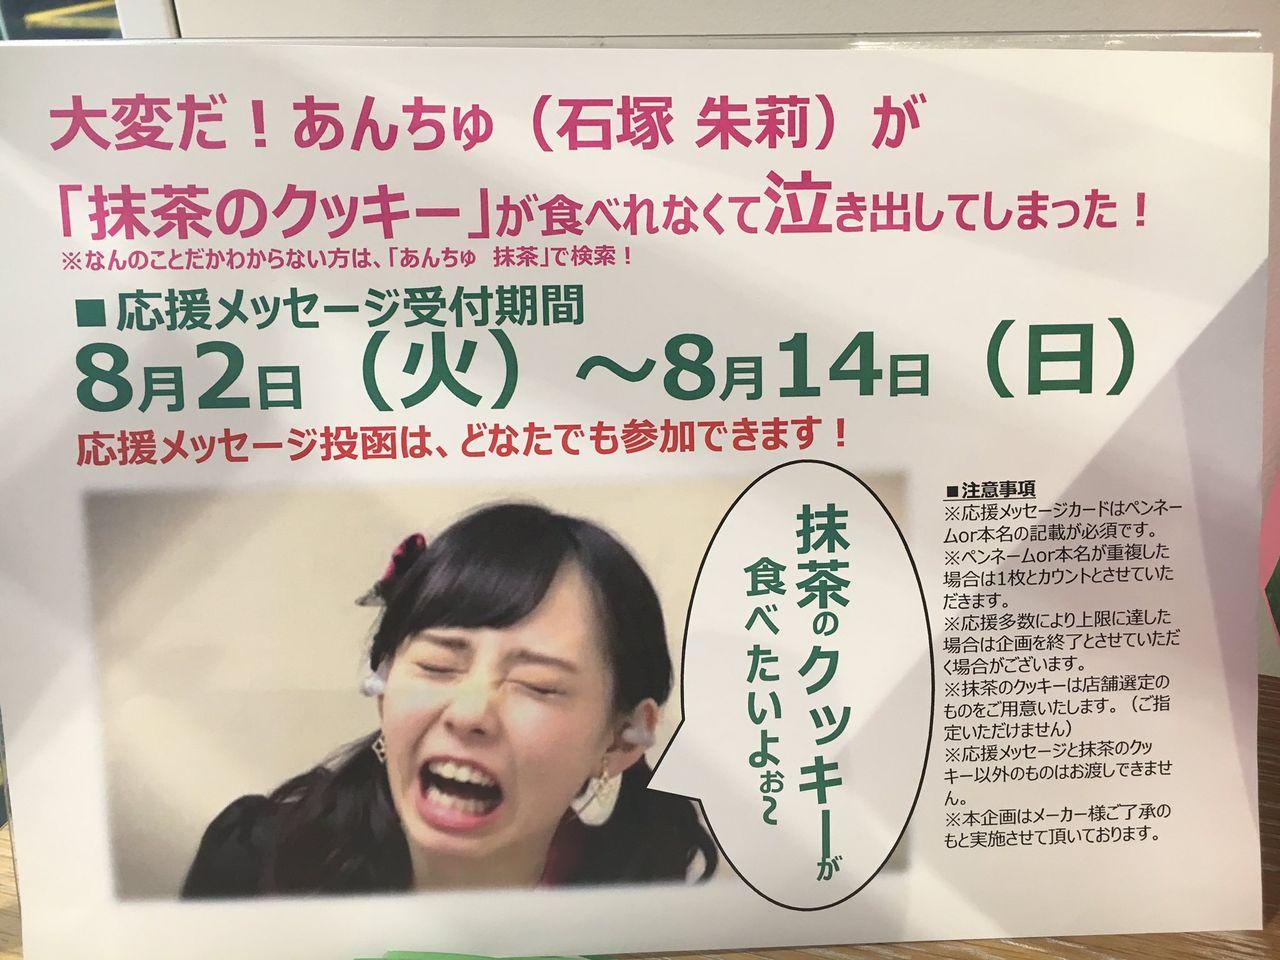 TSUTAYA戎橋がNMB48石塚朱莉に抹茶クッキーを贈る企画実施中wwwwww